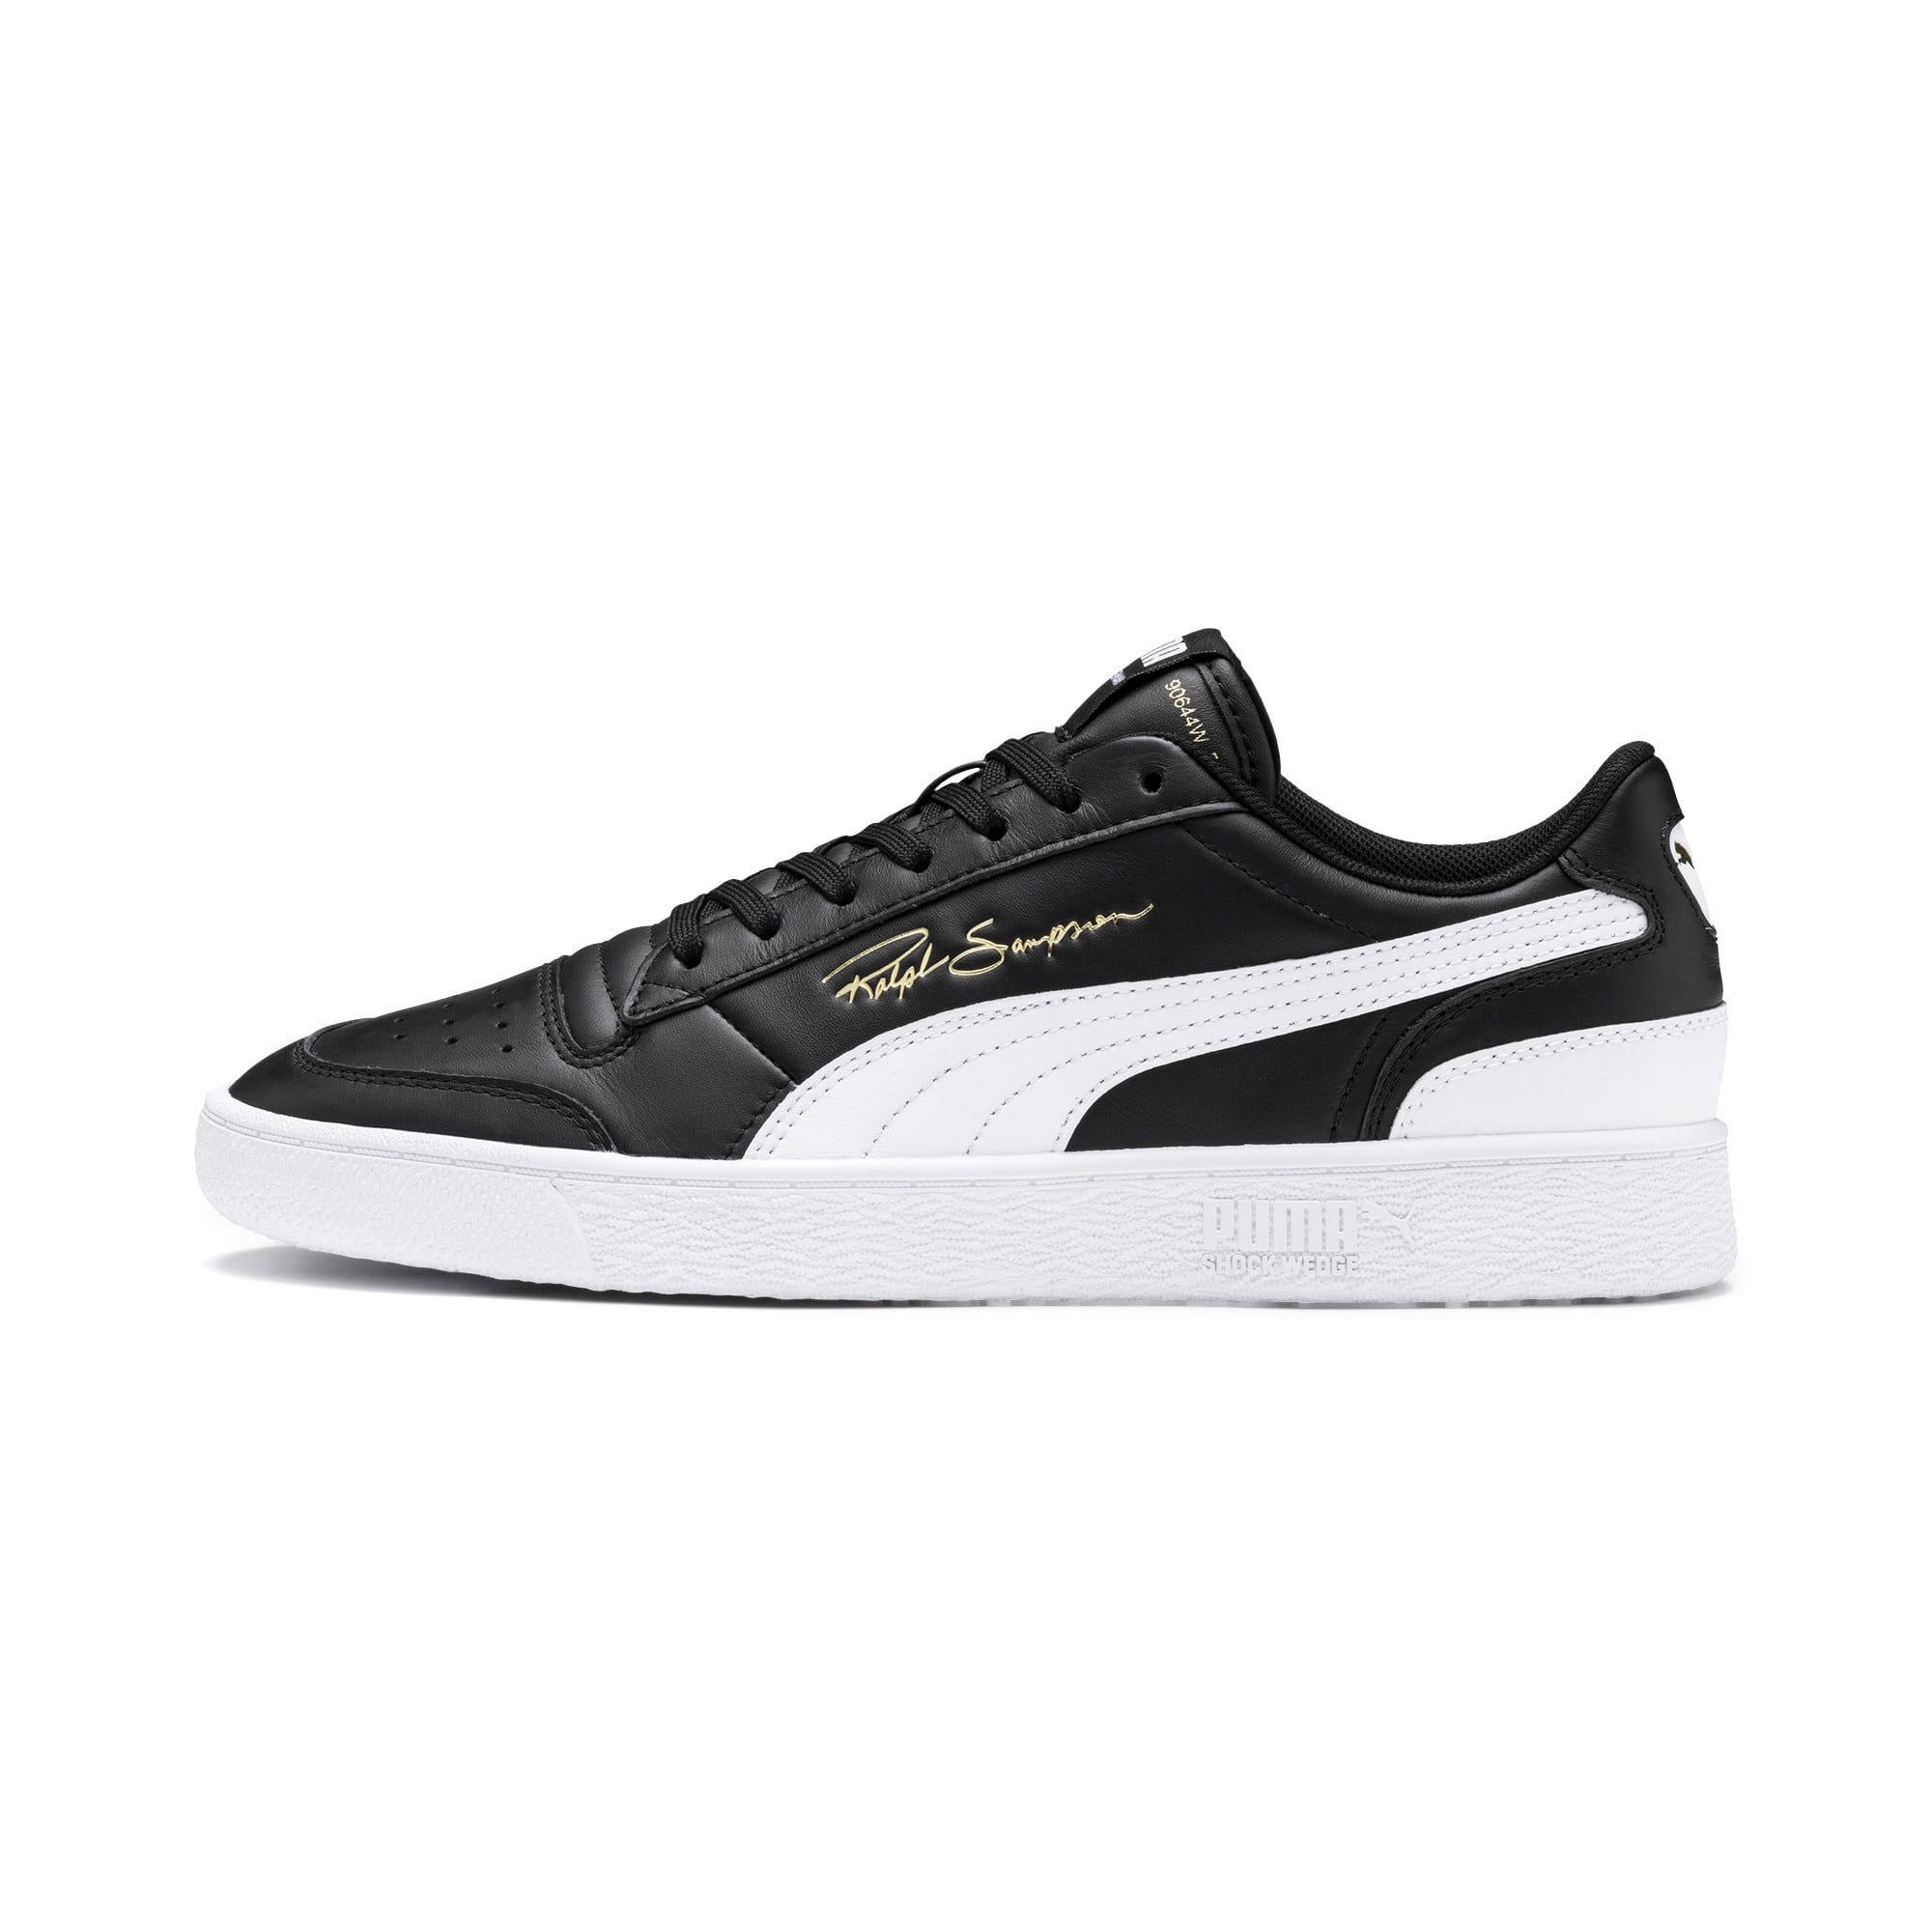 Thumbnail 1 of Ralph Sampson Lo Sneakers, Puma Blk-Puma Wht-Puma Wht, medium